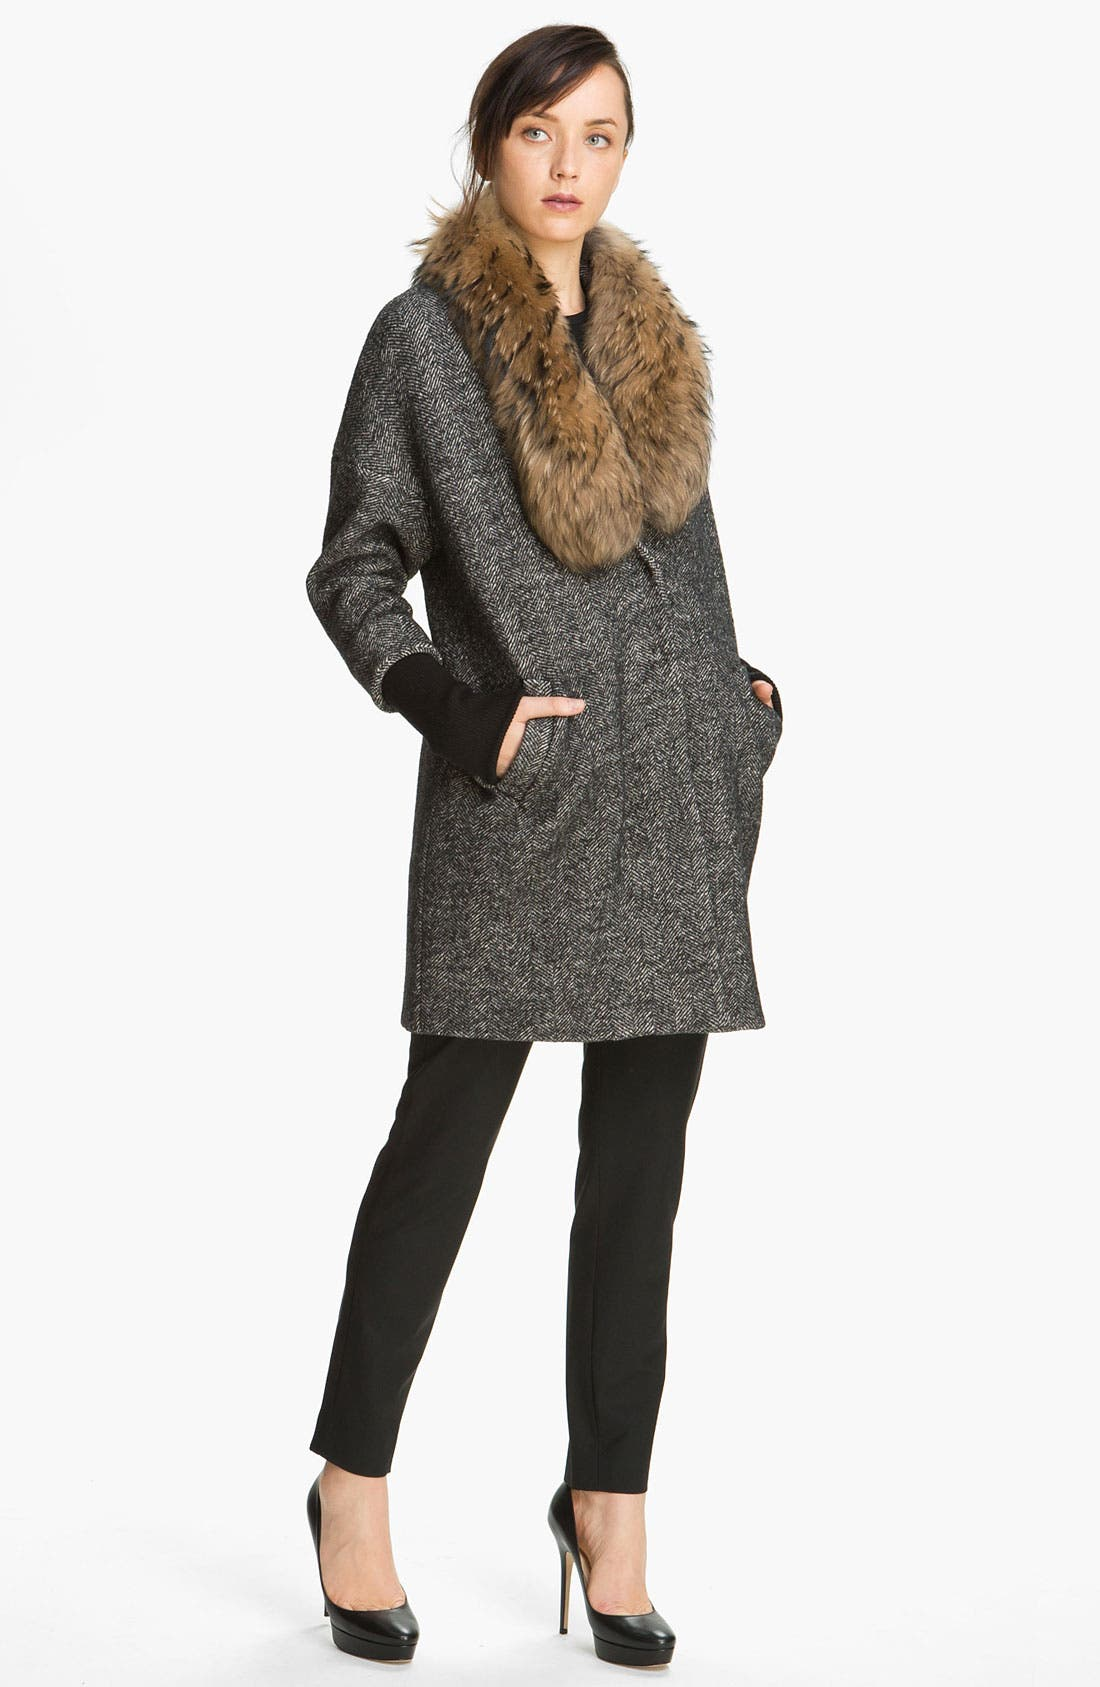 Main Image - Elizabeth and James 'Valentia' Herringbone Coat with Removable Fur Collar